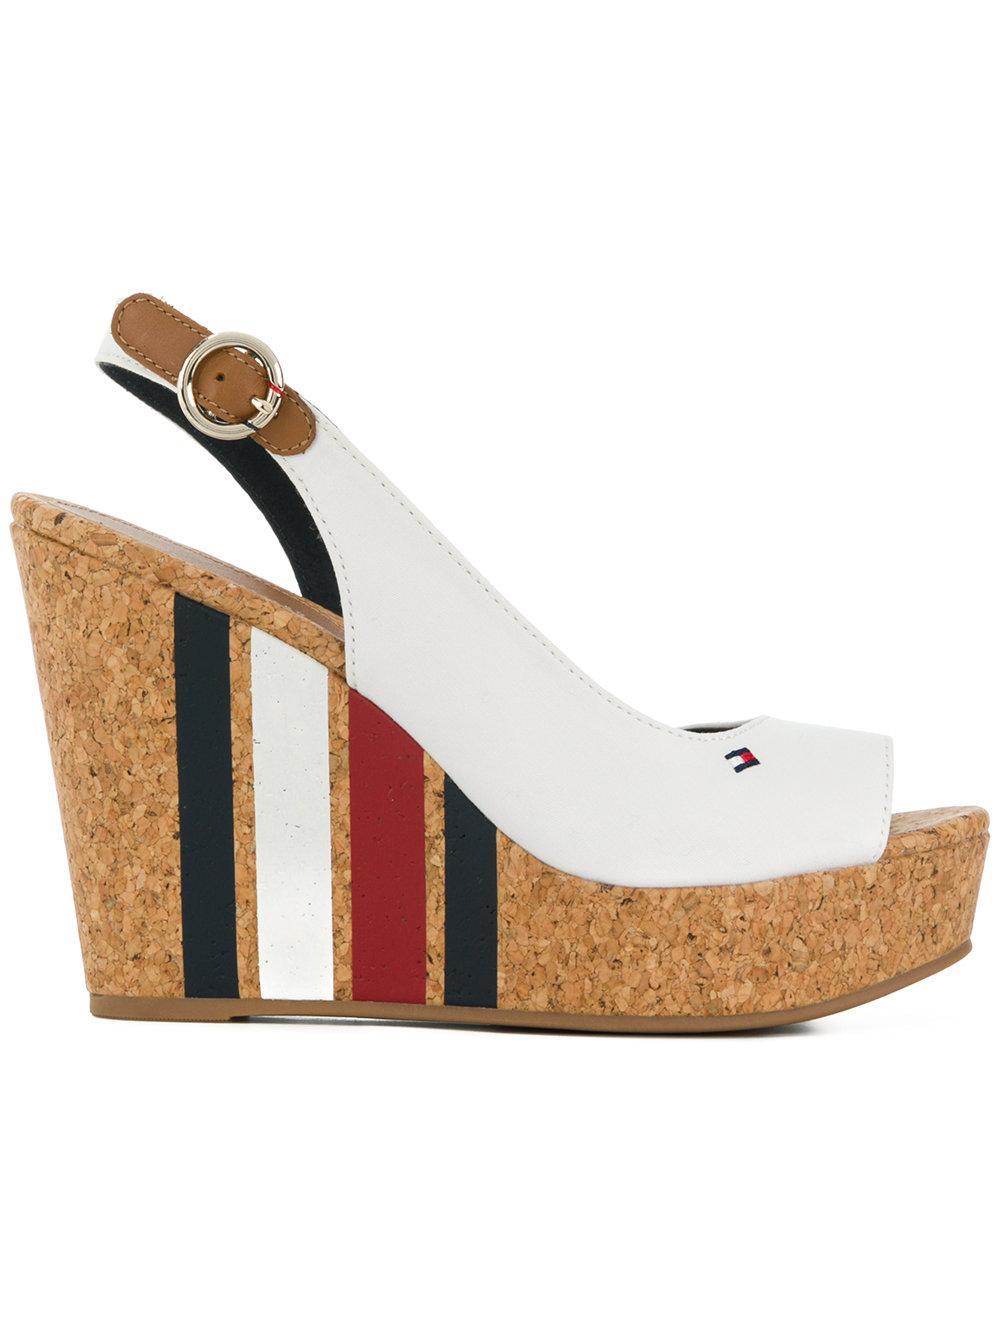 6ec09163e672 Tommy Hilfiger Striped Wedge Heel Sandals - White